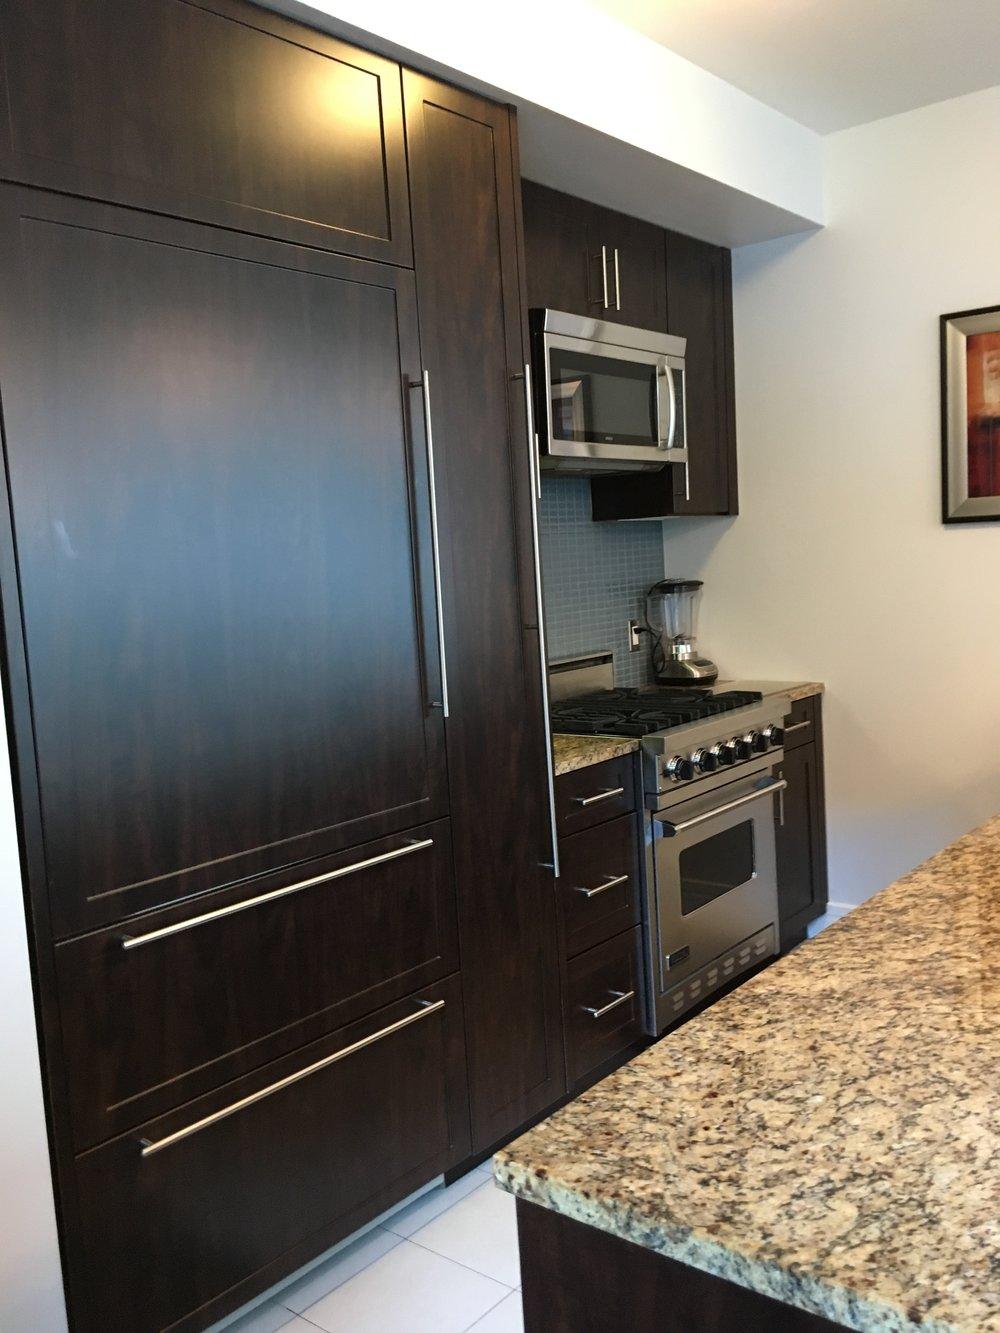 Philadelphia Luxury Home Condo-the ritz carlton residences 15A bryant wilde realty5.JPG